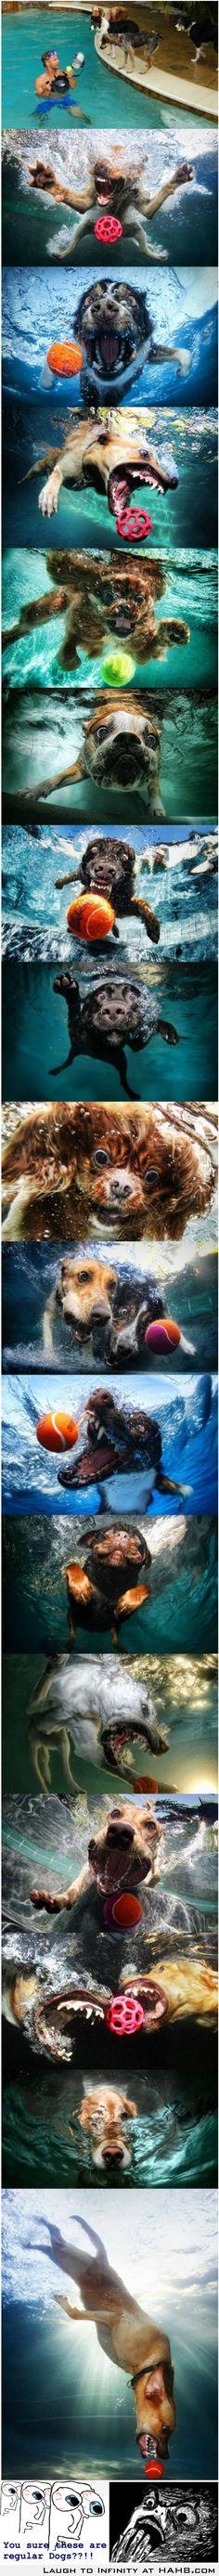 Dogs gone Wild!